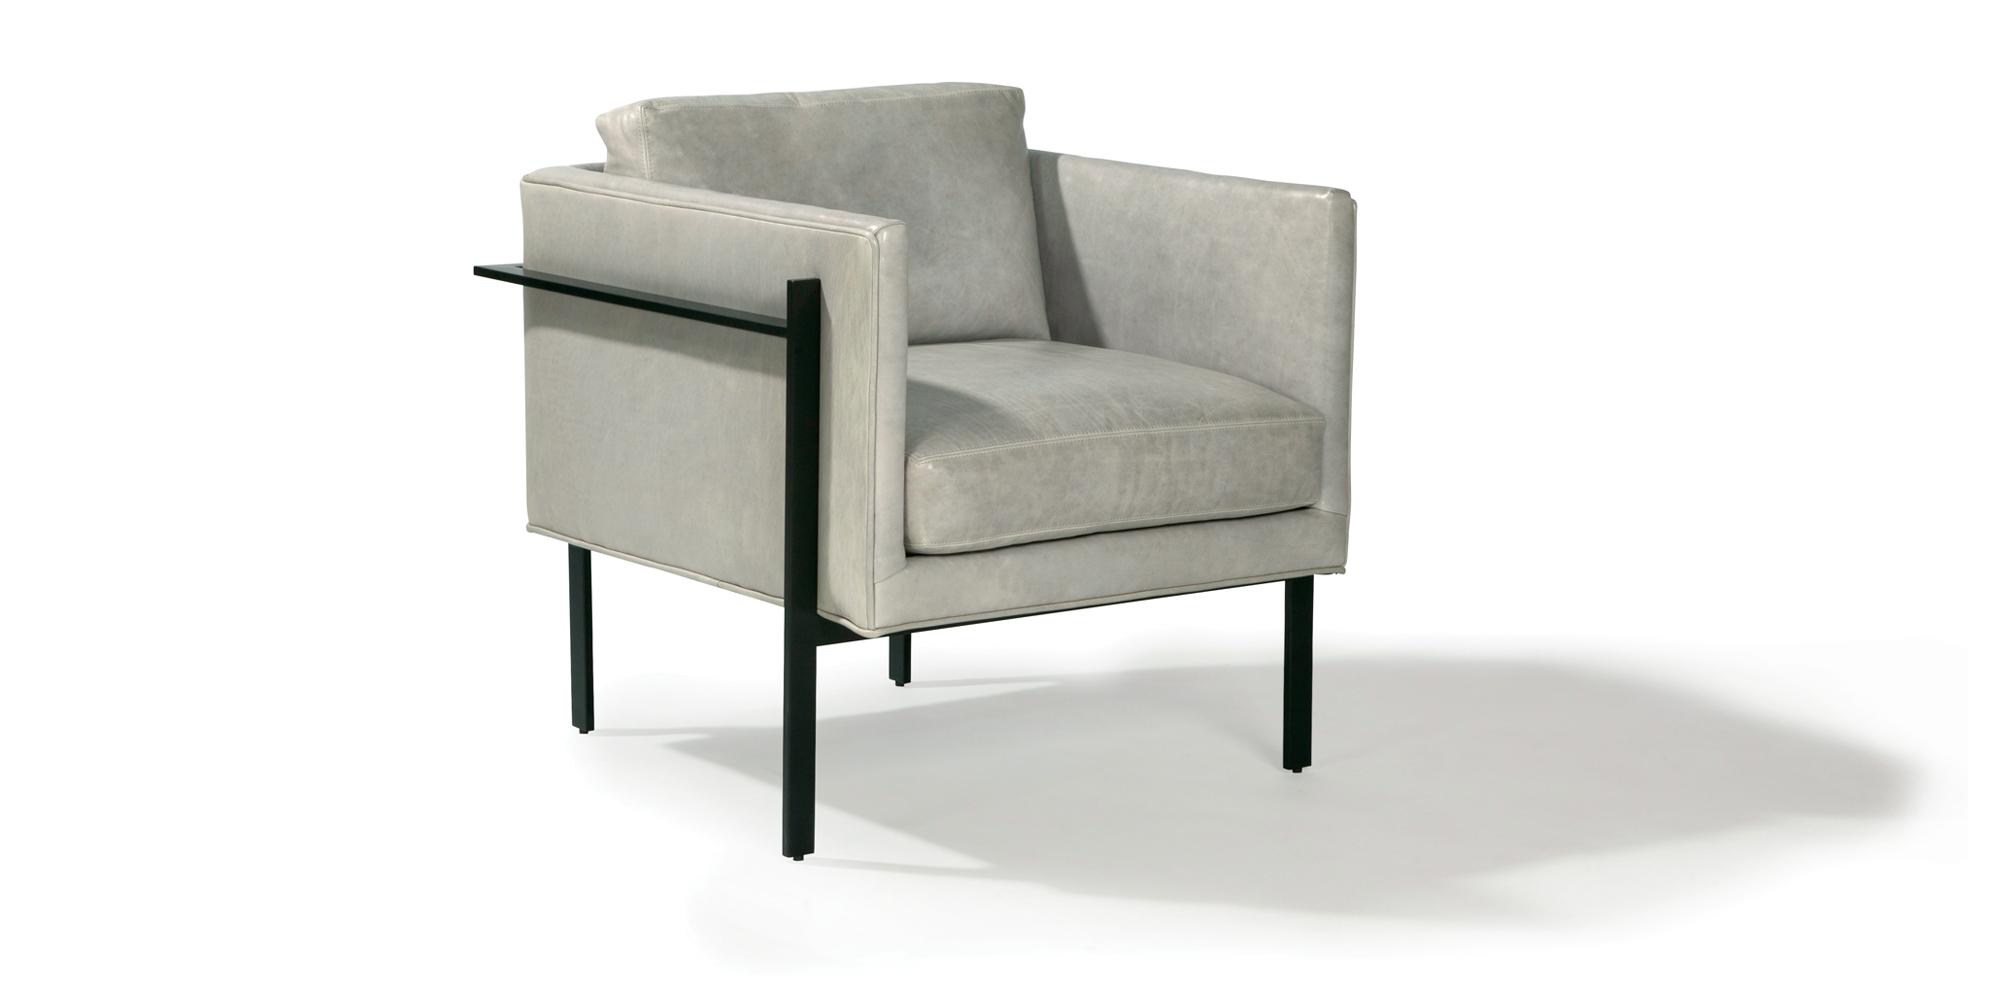 Drop In Lounge Chairs (Black Powder Coat)